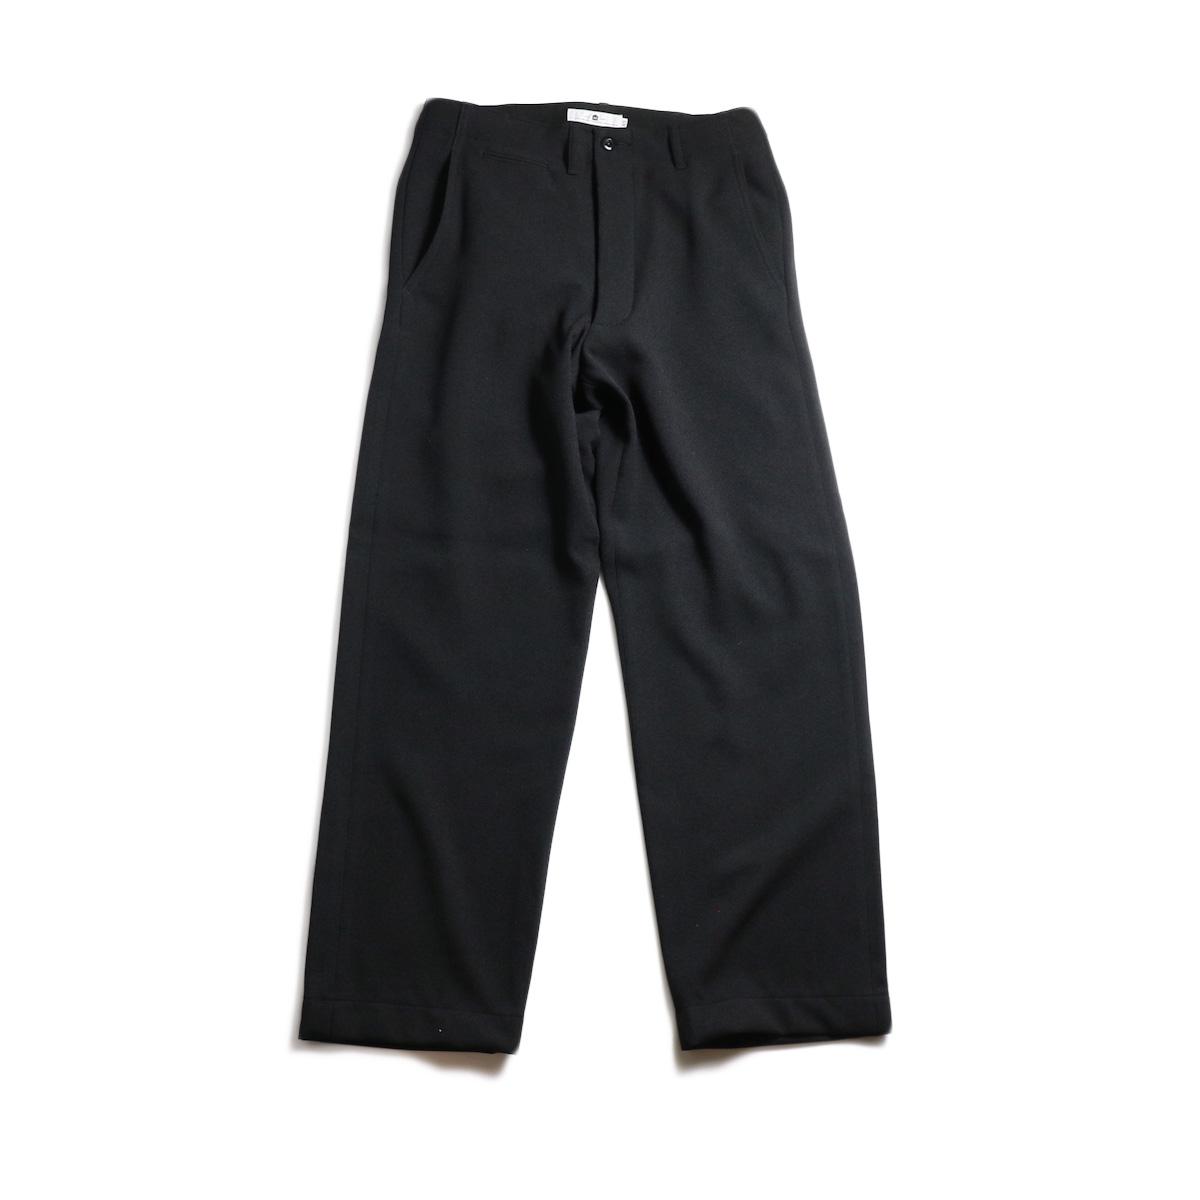 SGGM / M-17 Poly Trouser (Black Mix)